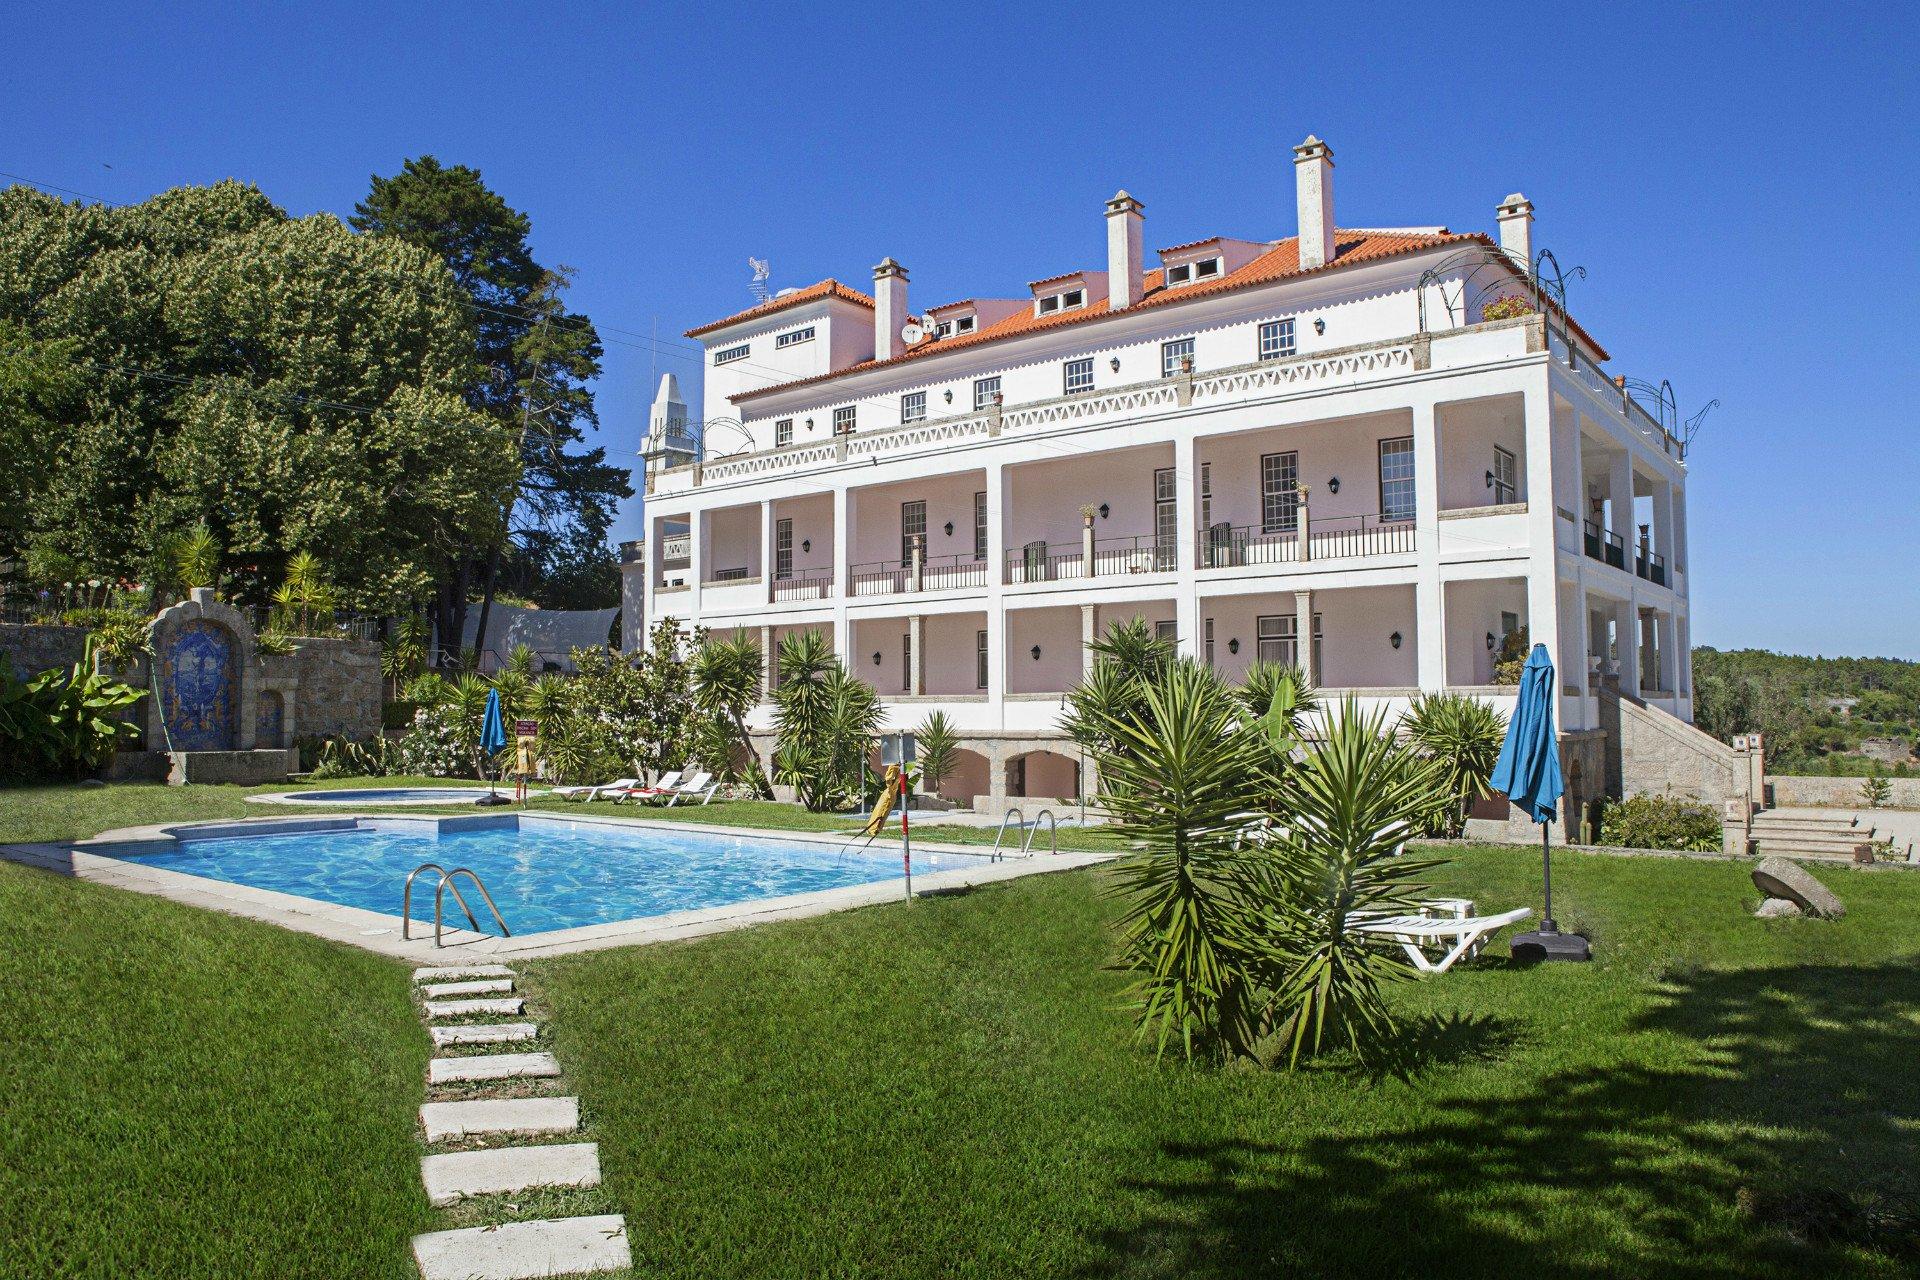 Farm Ranch in Abrunhosa-a-Velha, Viseu District, Portugal 1